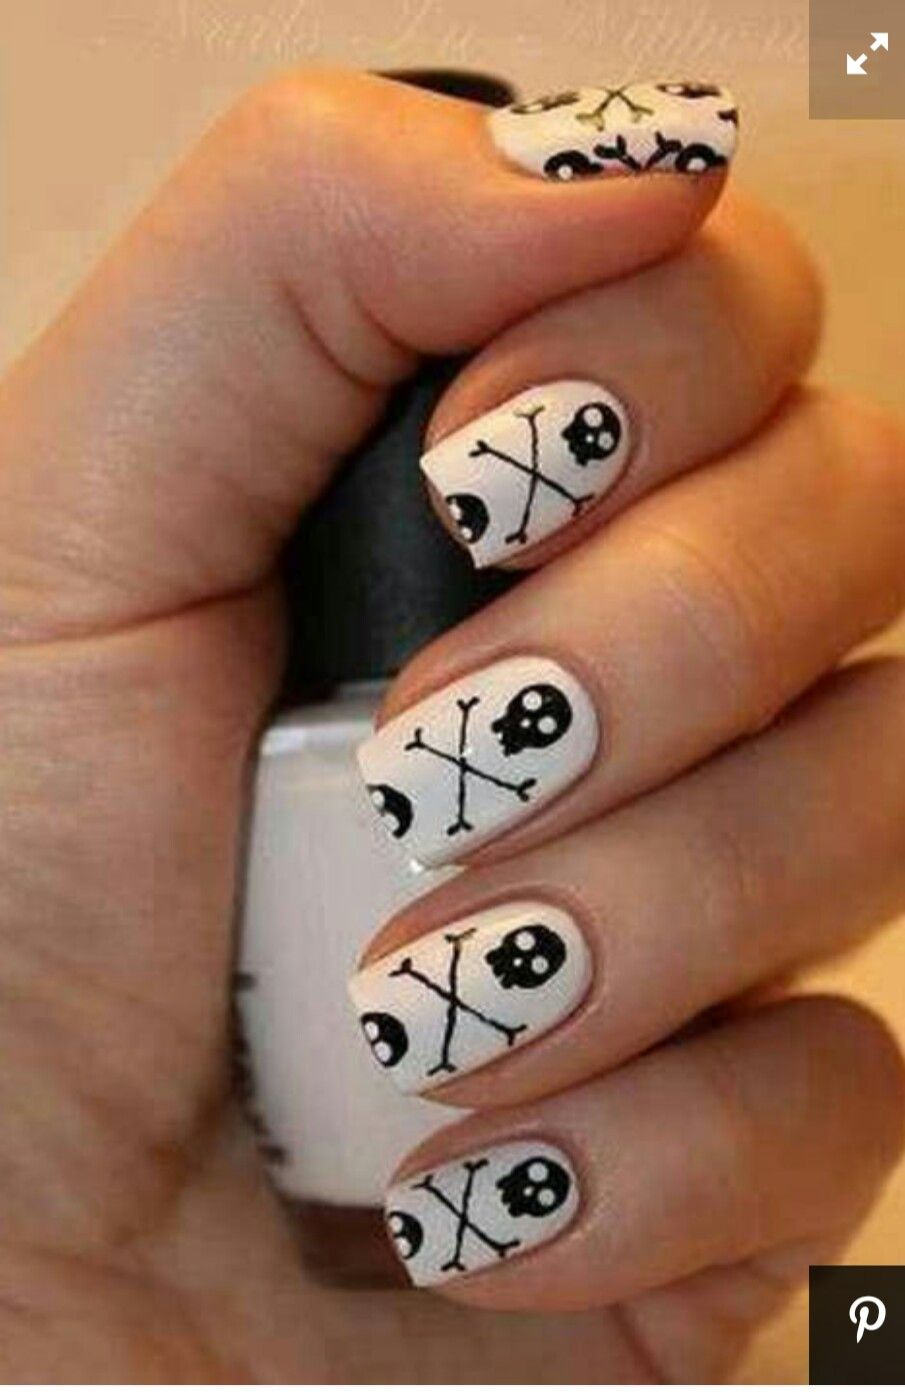 pinamy on halloween nails | pinterest | halloween nails